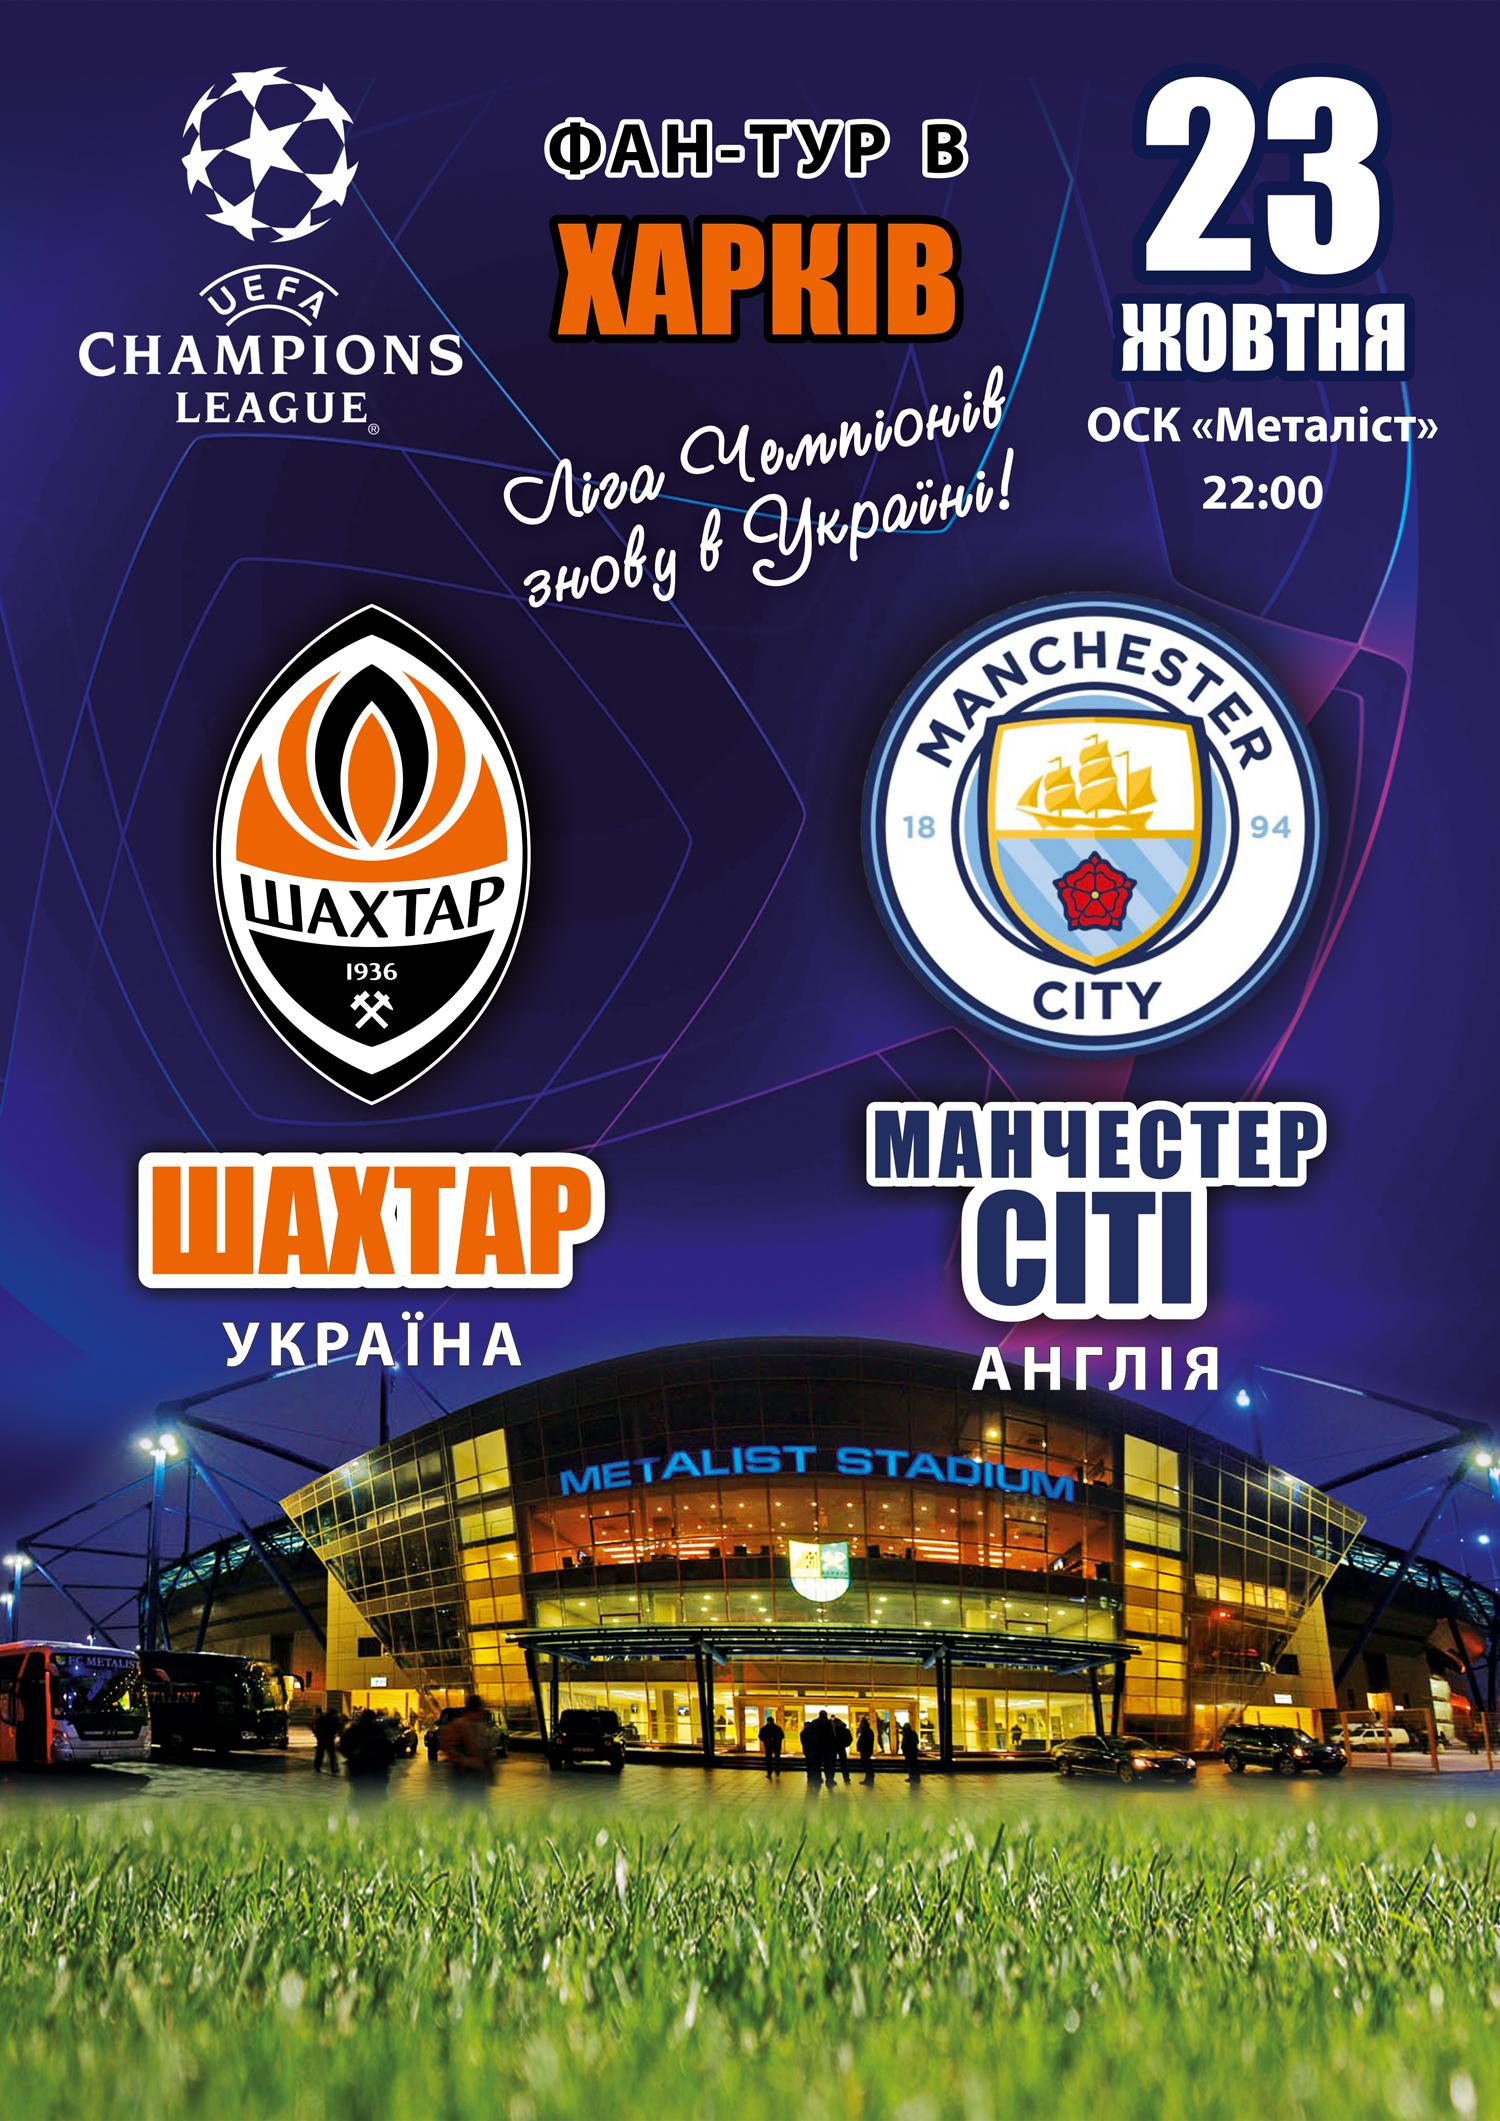 Фан-тур на матч Лиги Чемпионов Шахтер–Манчестер Сити (Полтава)